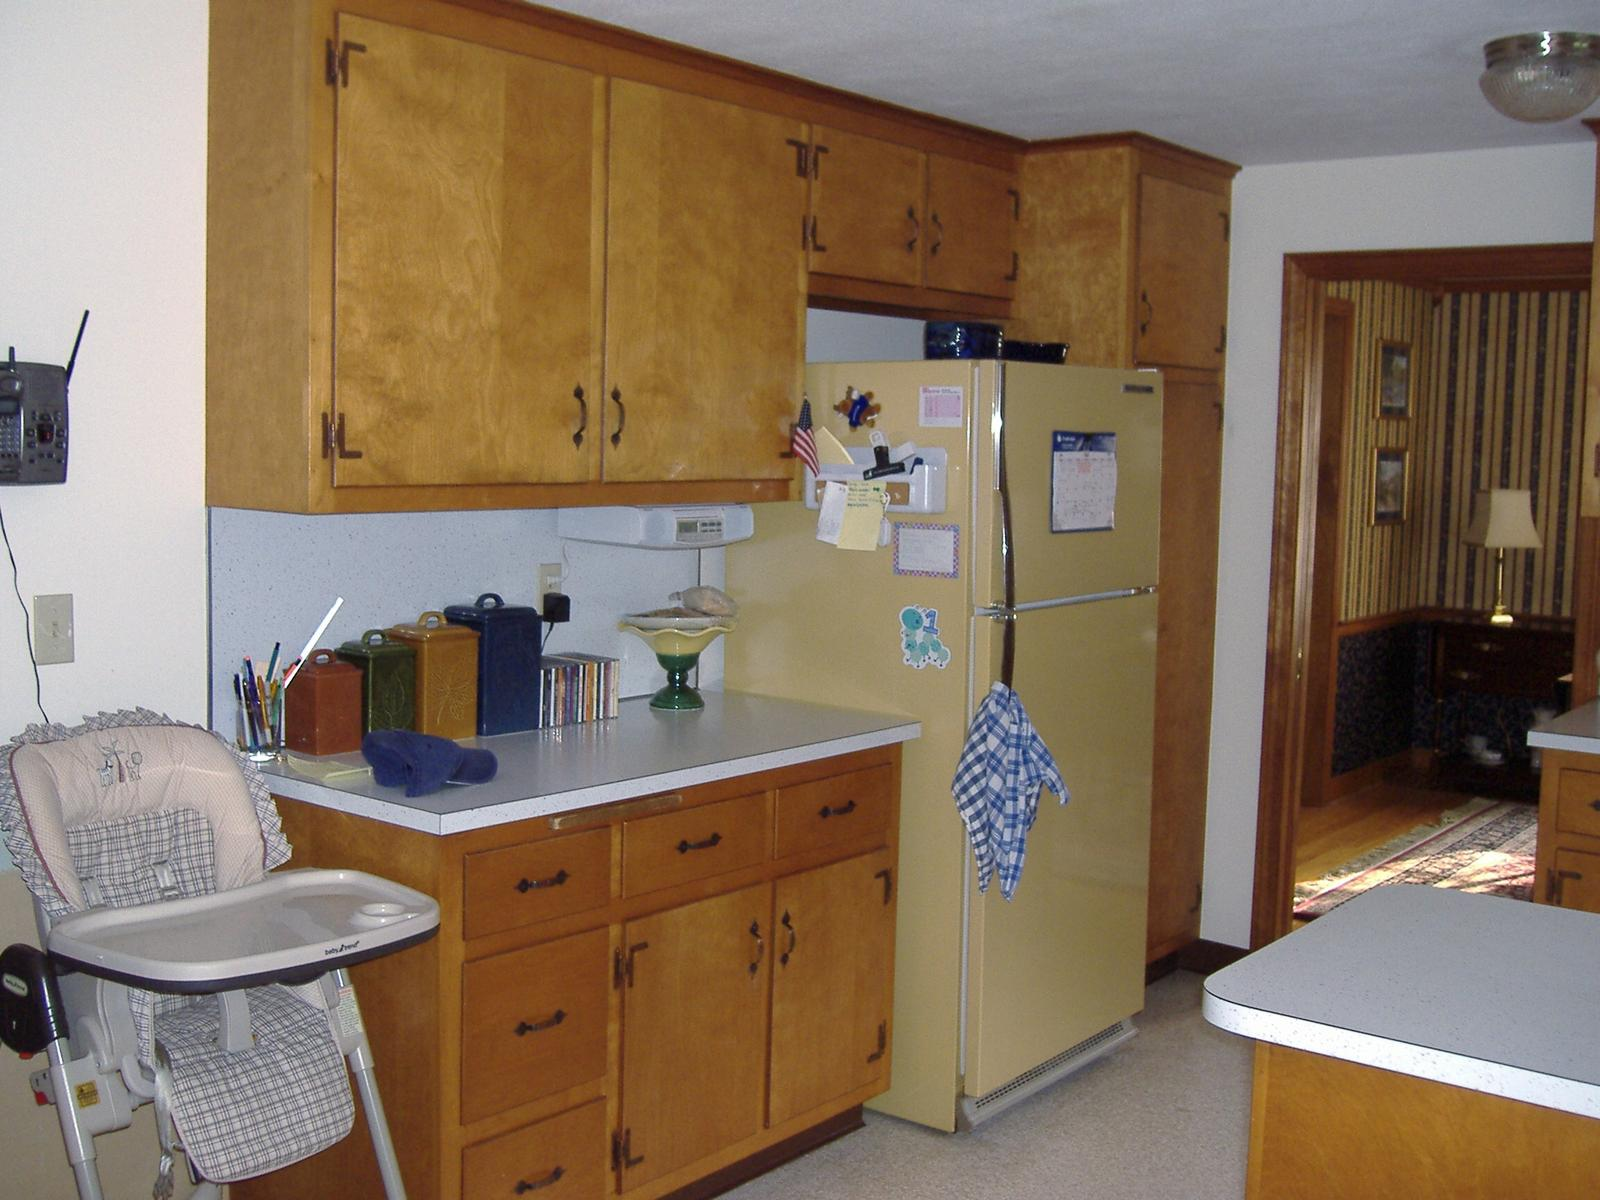 Kitchen cabinets manchester ct -  Granite Kitchen Remodeling Hartford Area 001 Jpg